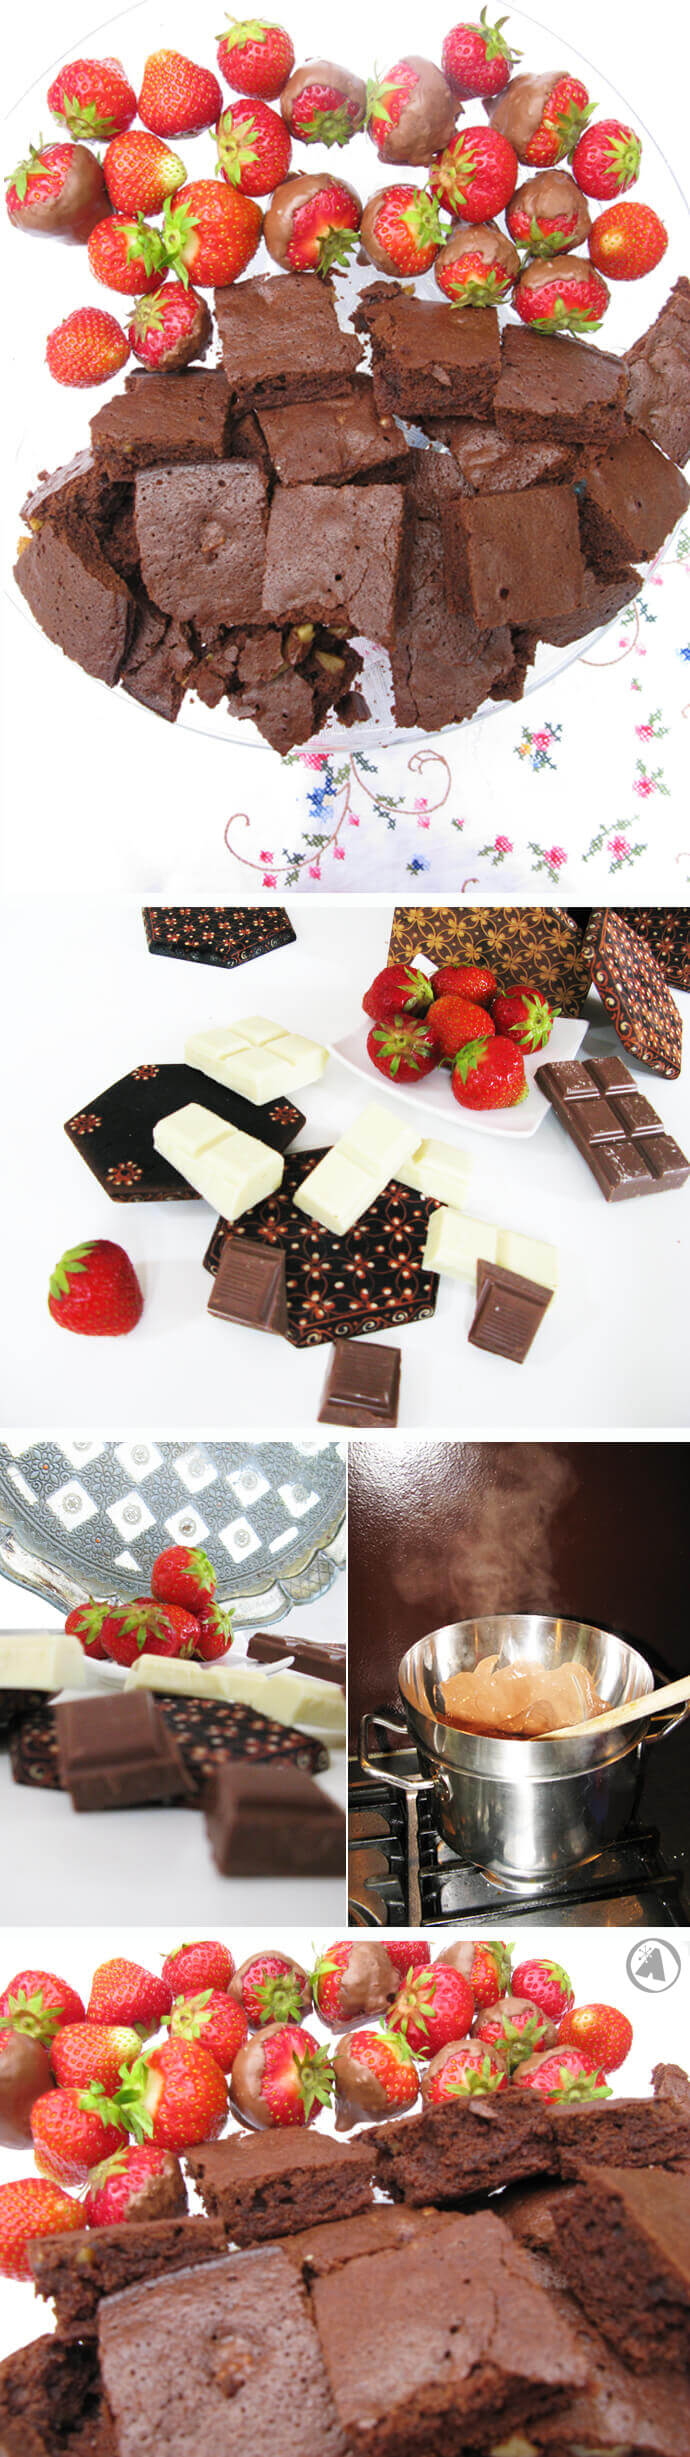 fresas-con-chocolate-2